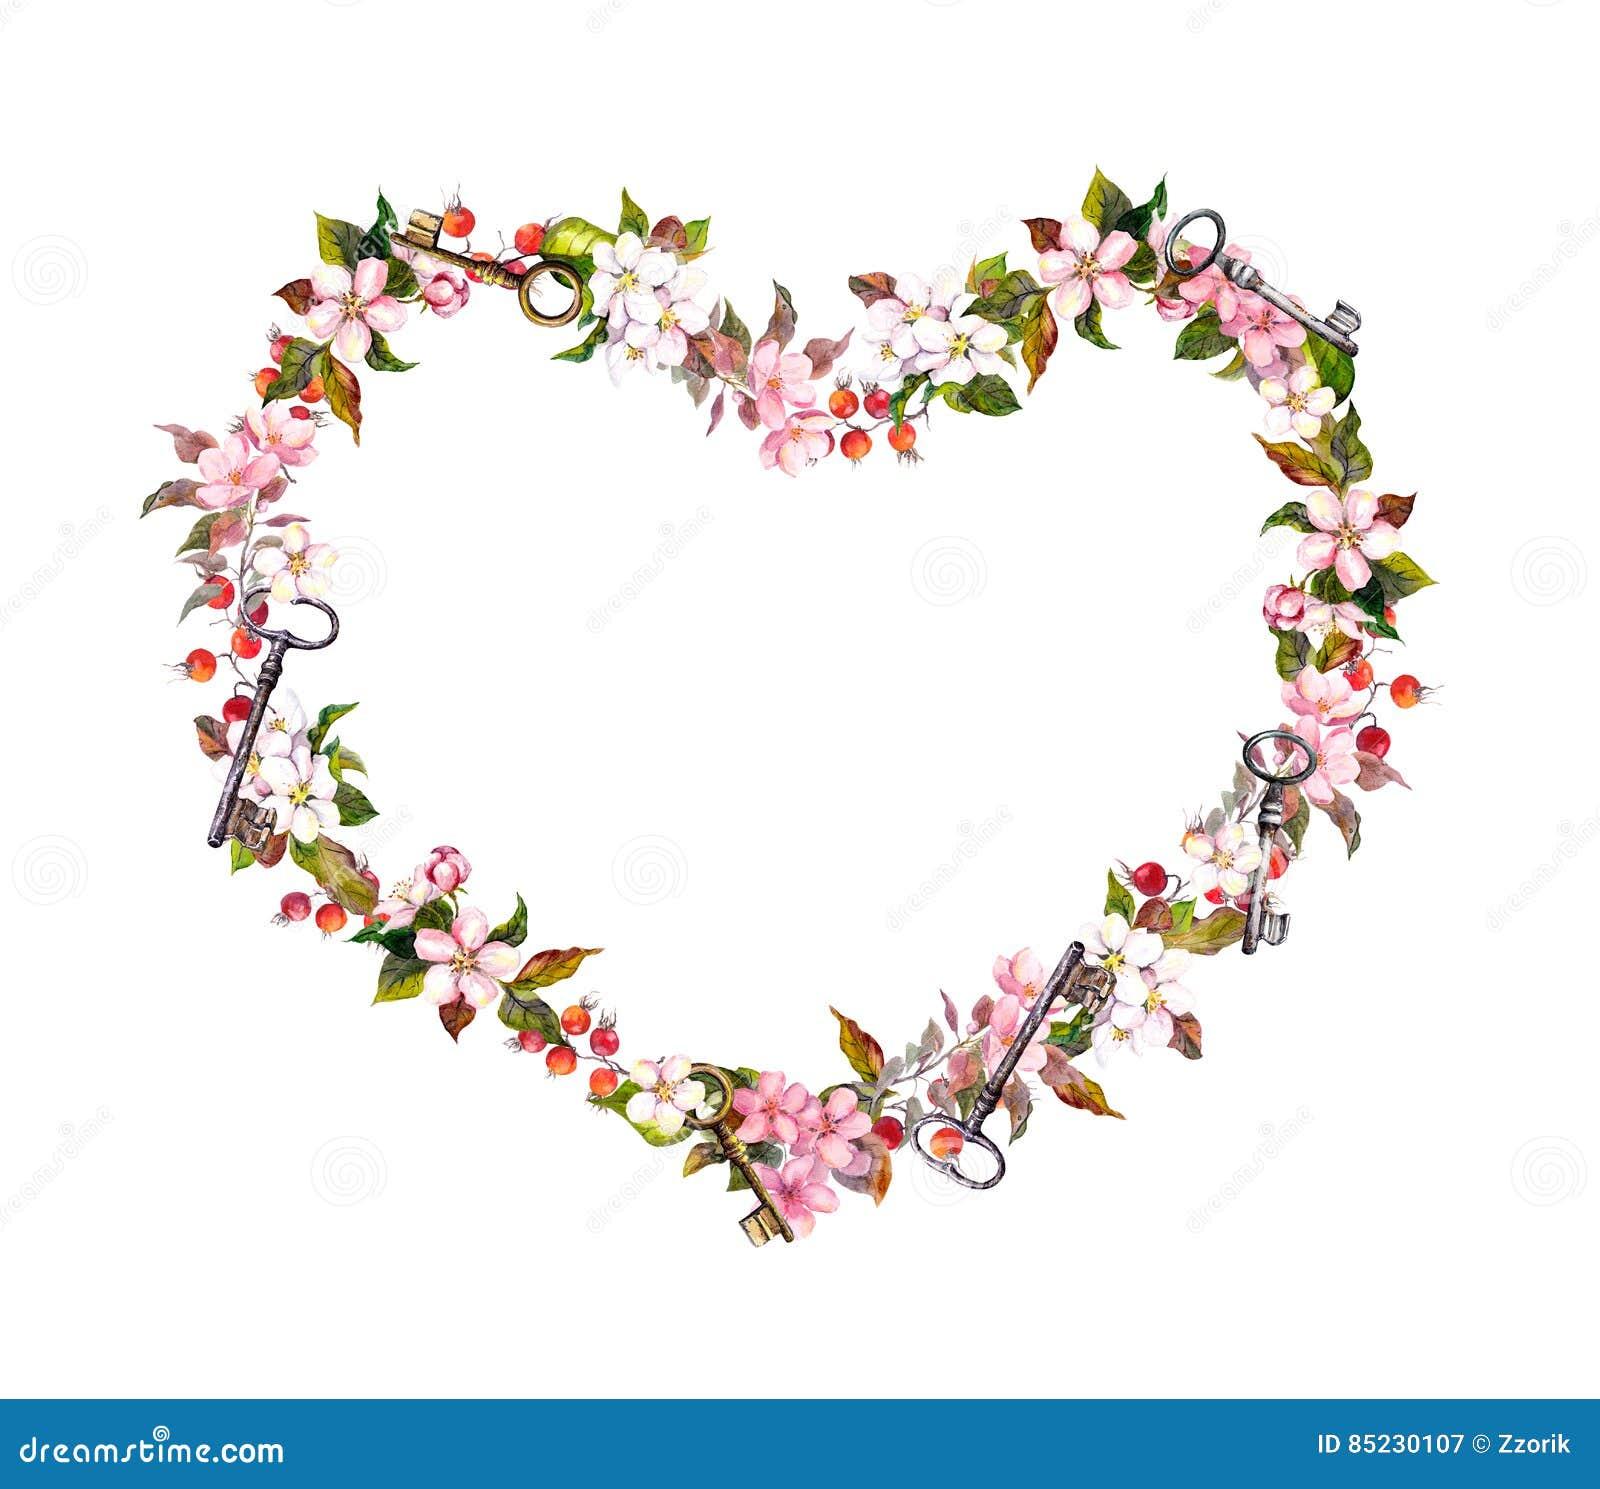 Floral wreath heart shape pink flowers hearts keys watercolor pink flowers hearts keys watercolor for valentine mightylinksfo